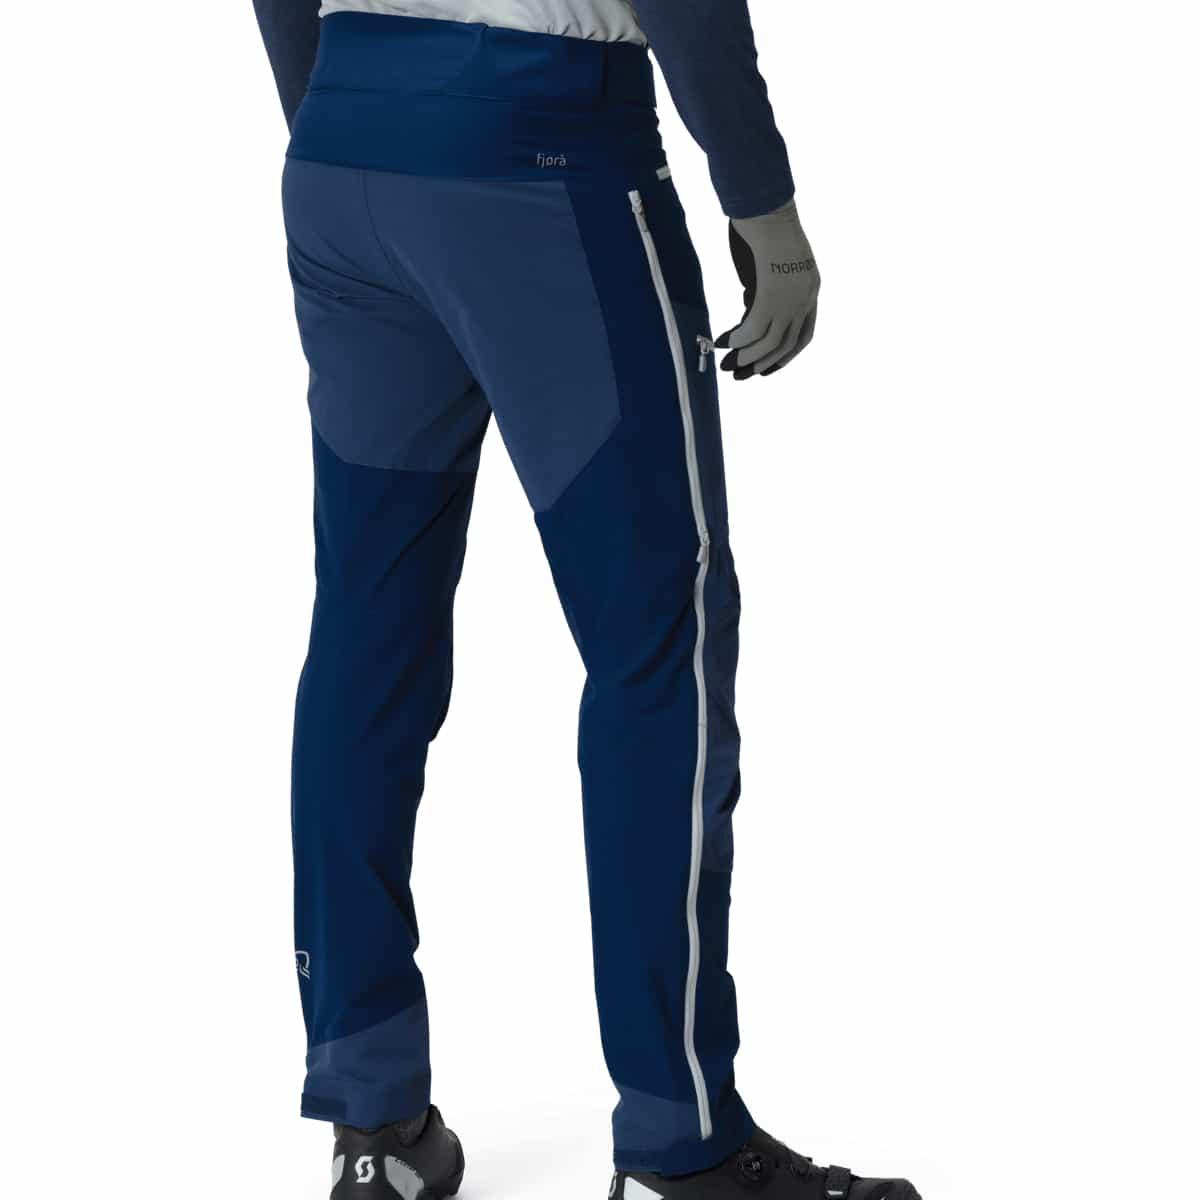 Norrøna Fjørå Flex1 Pants (M) Castor GreyCaviar